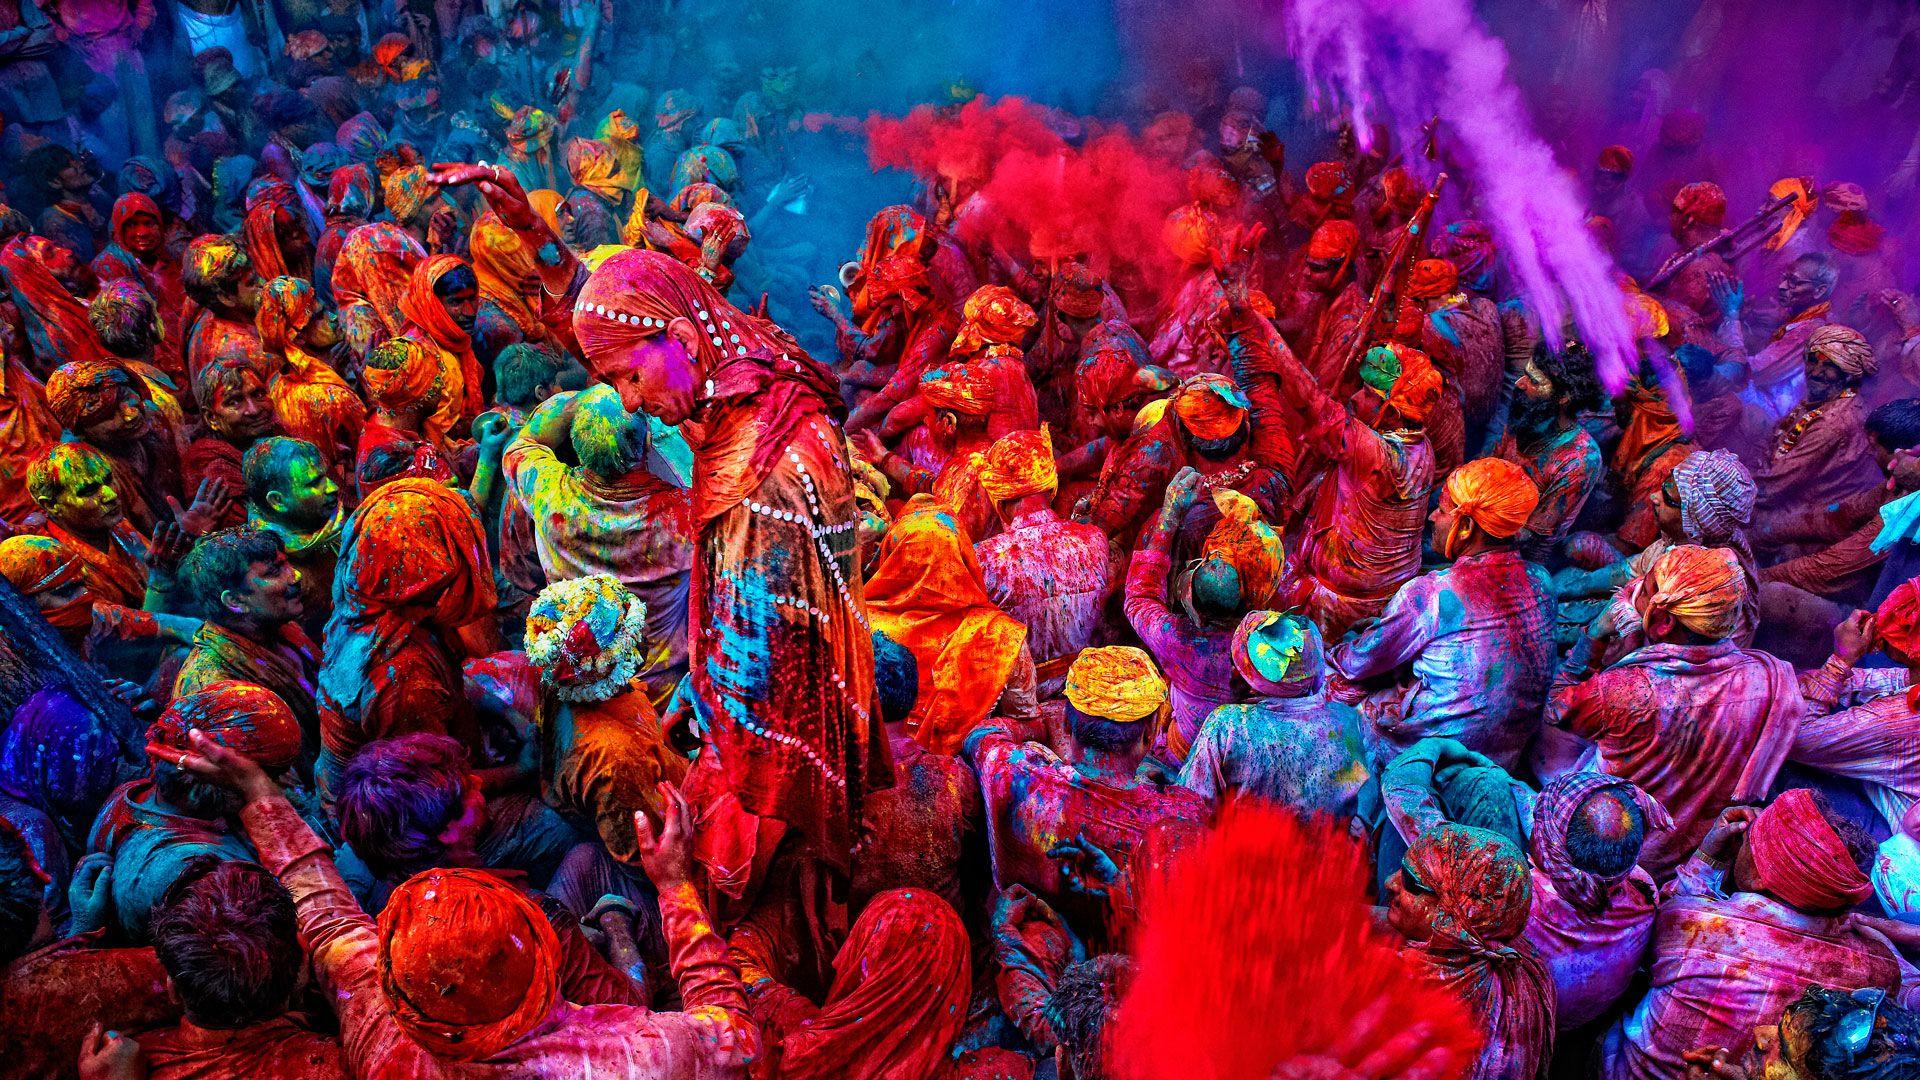 Pin By B2b Hospitality On Bucket List Holi Festival Of Colours Holi Colors Color Festival